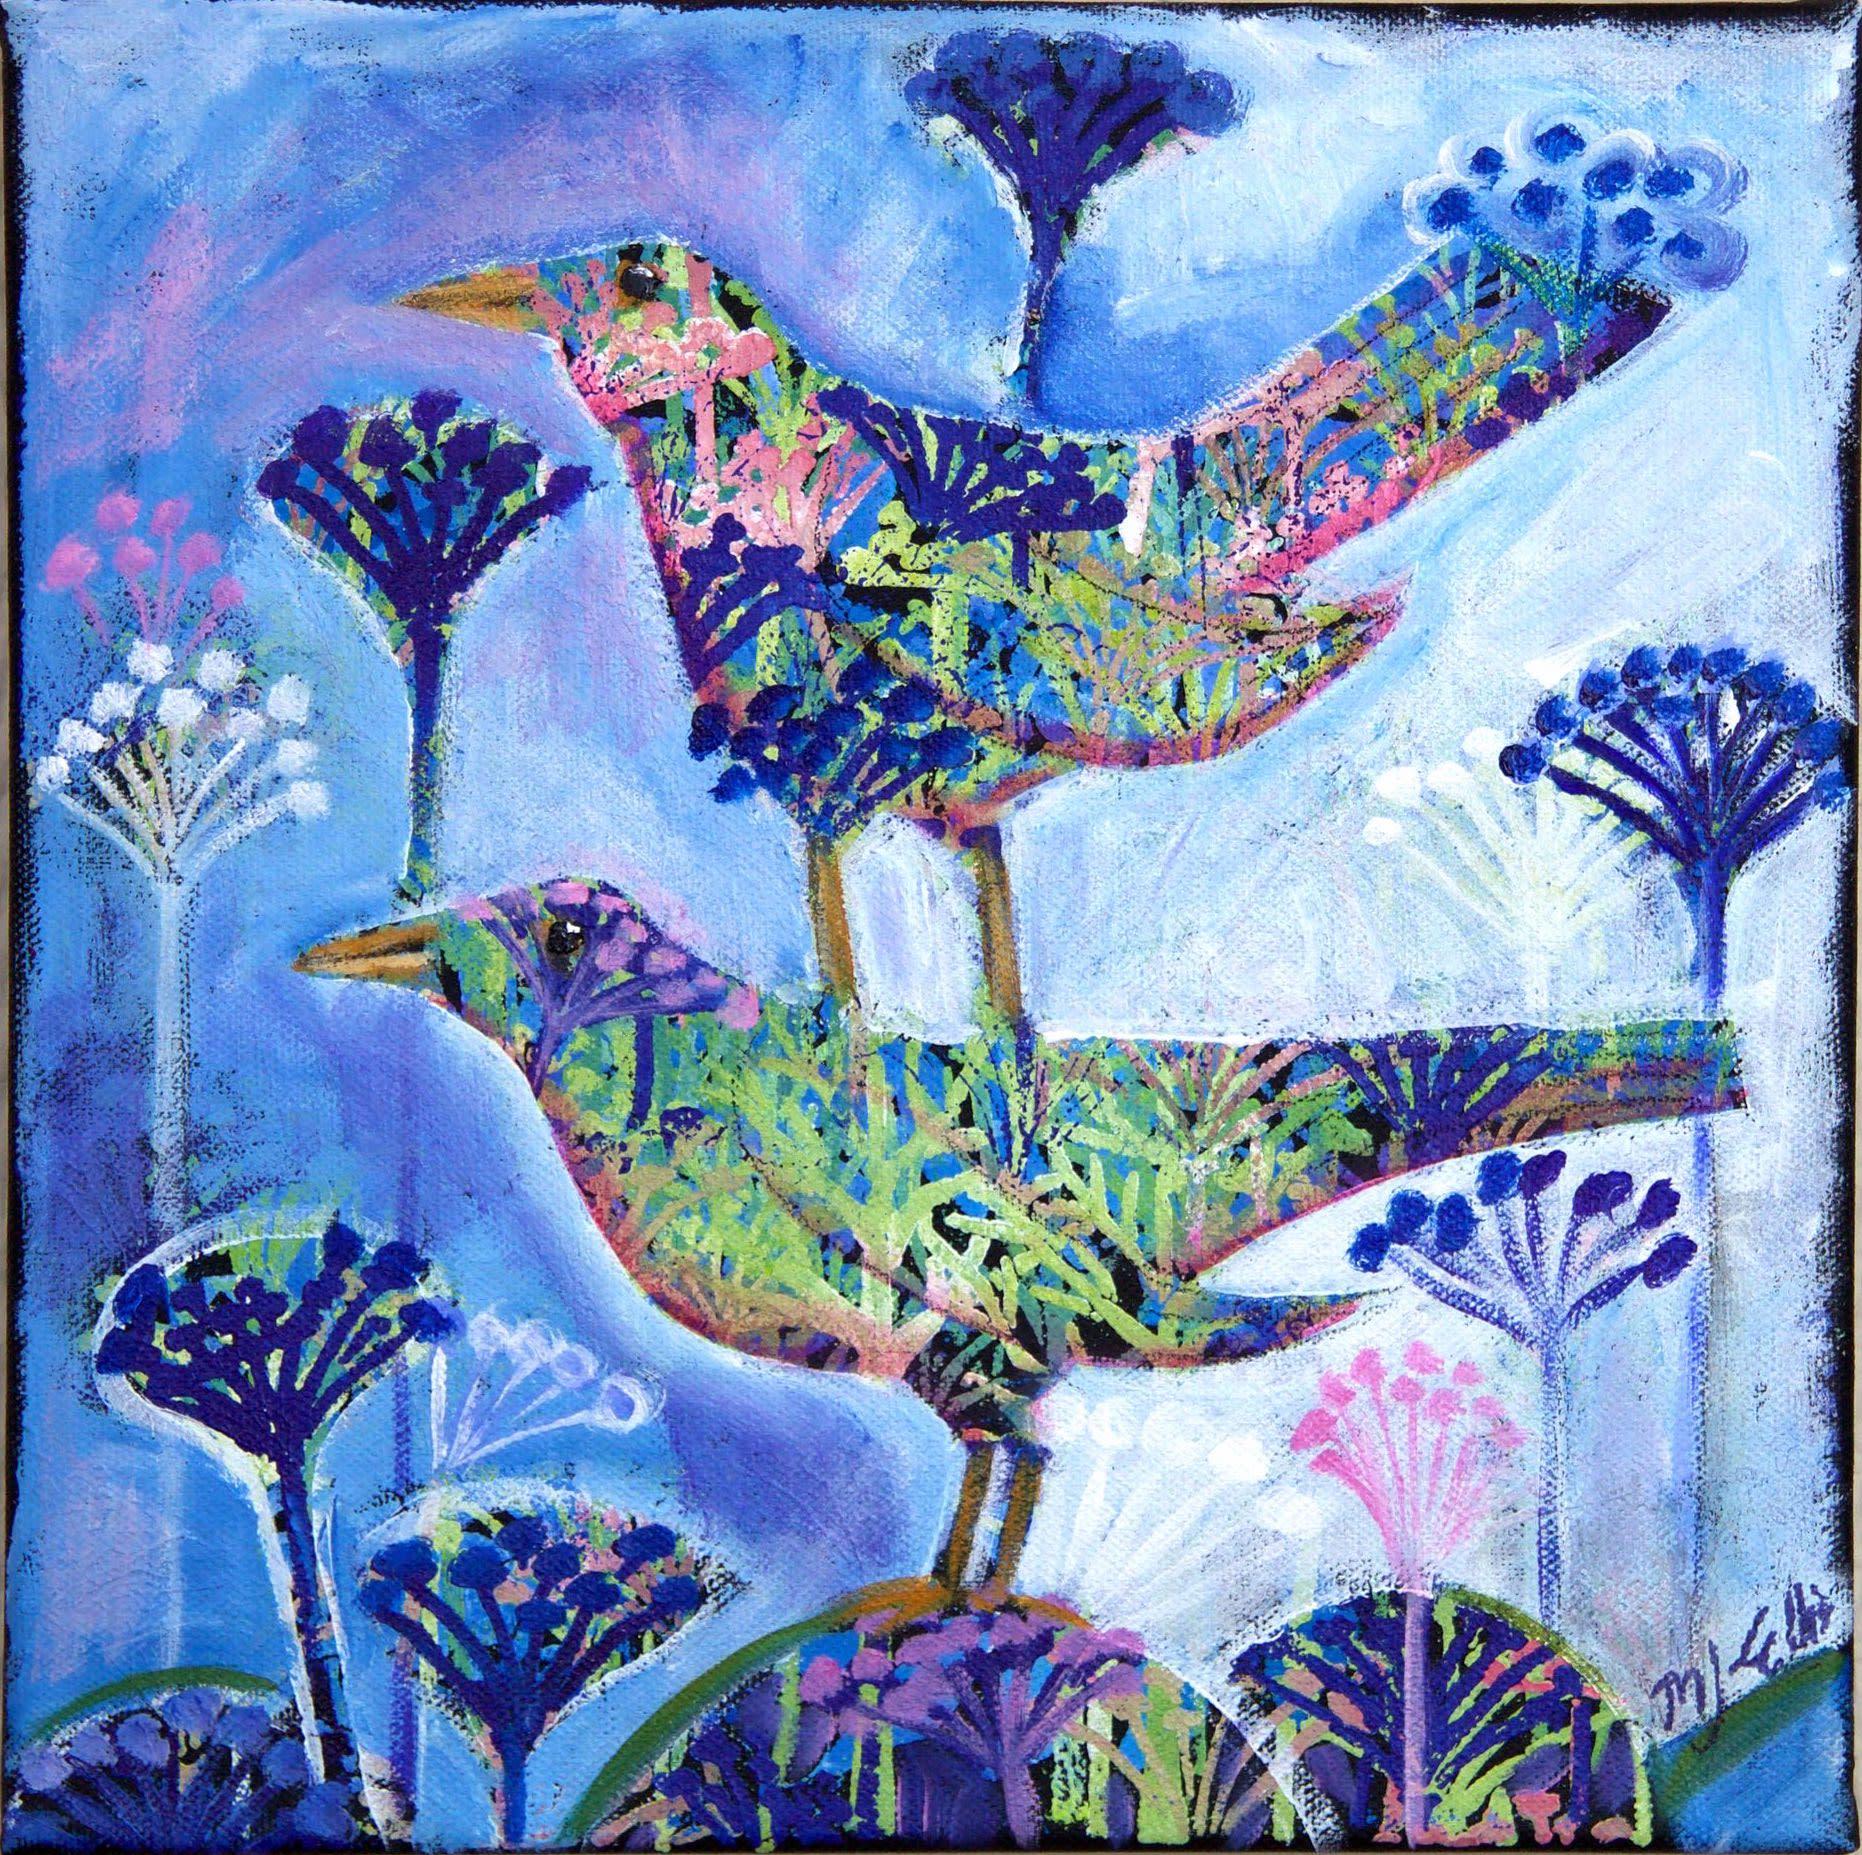 Birds blooms image ubt8lt